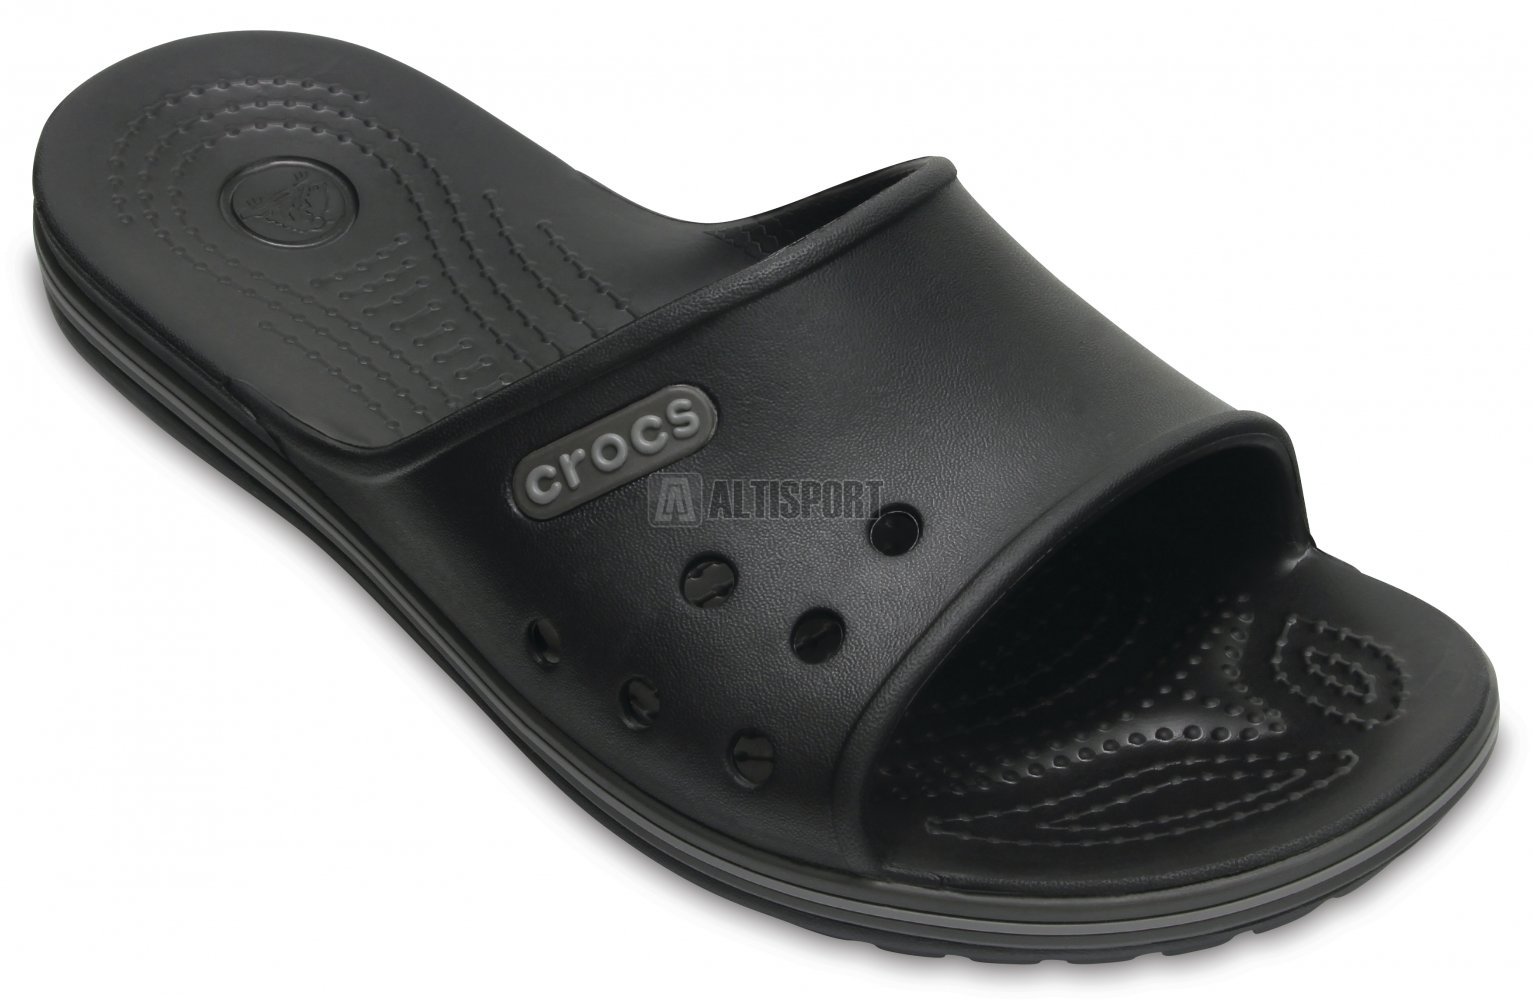 Pánské pantofle CROCS CROCBAND II SLIDE 204108-02S BLACK GRAPHITE ... 3ecff0153c